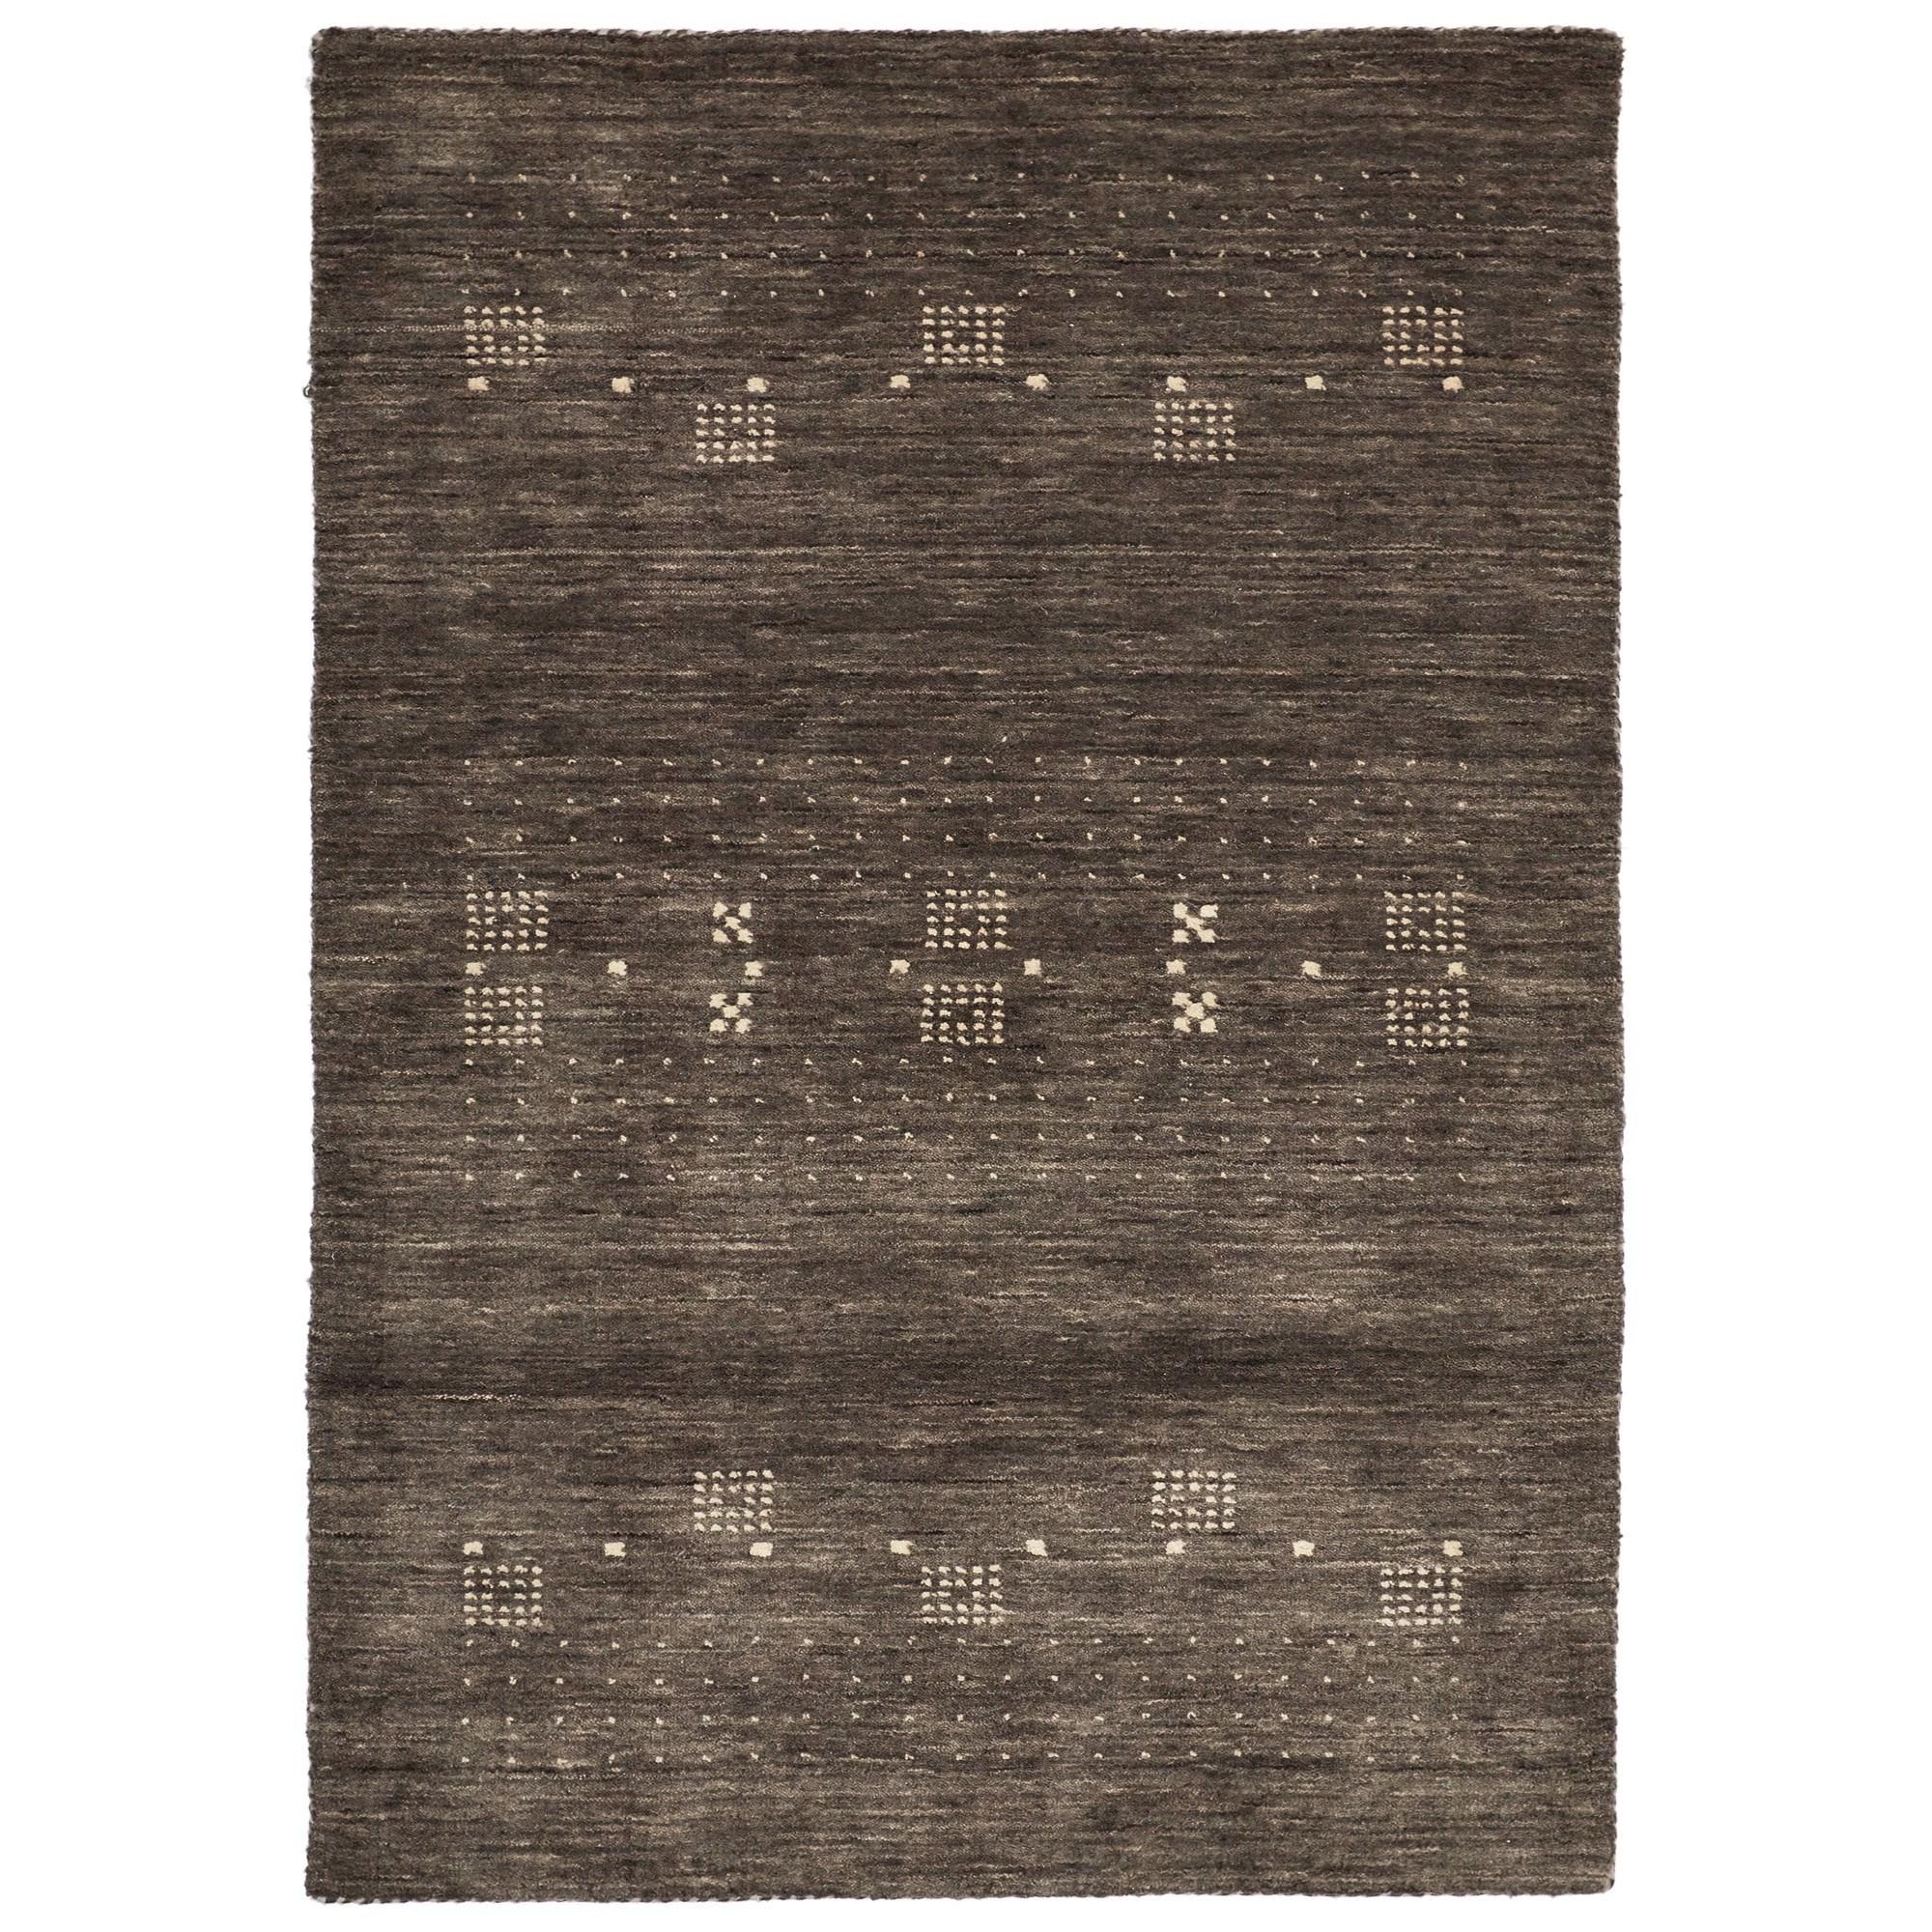 Lori No.042 Wool Tribal Rug, 290x200cm, Grey